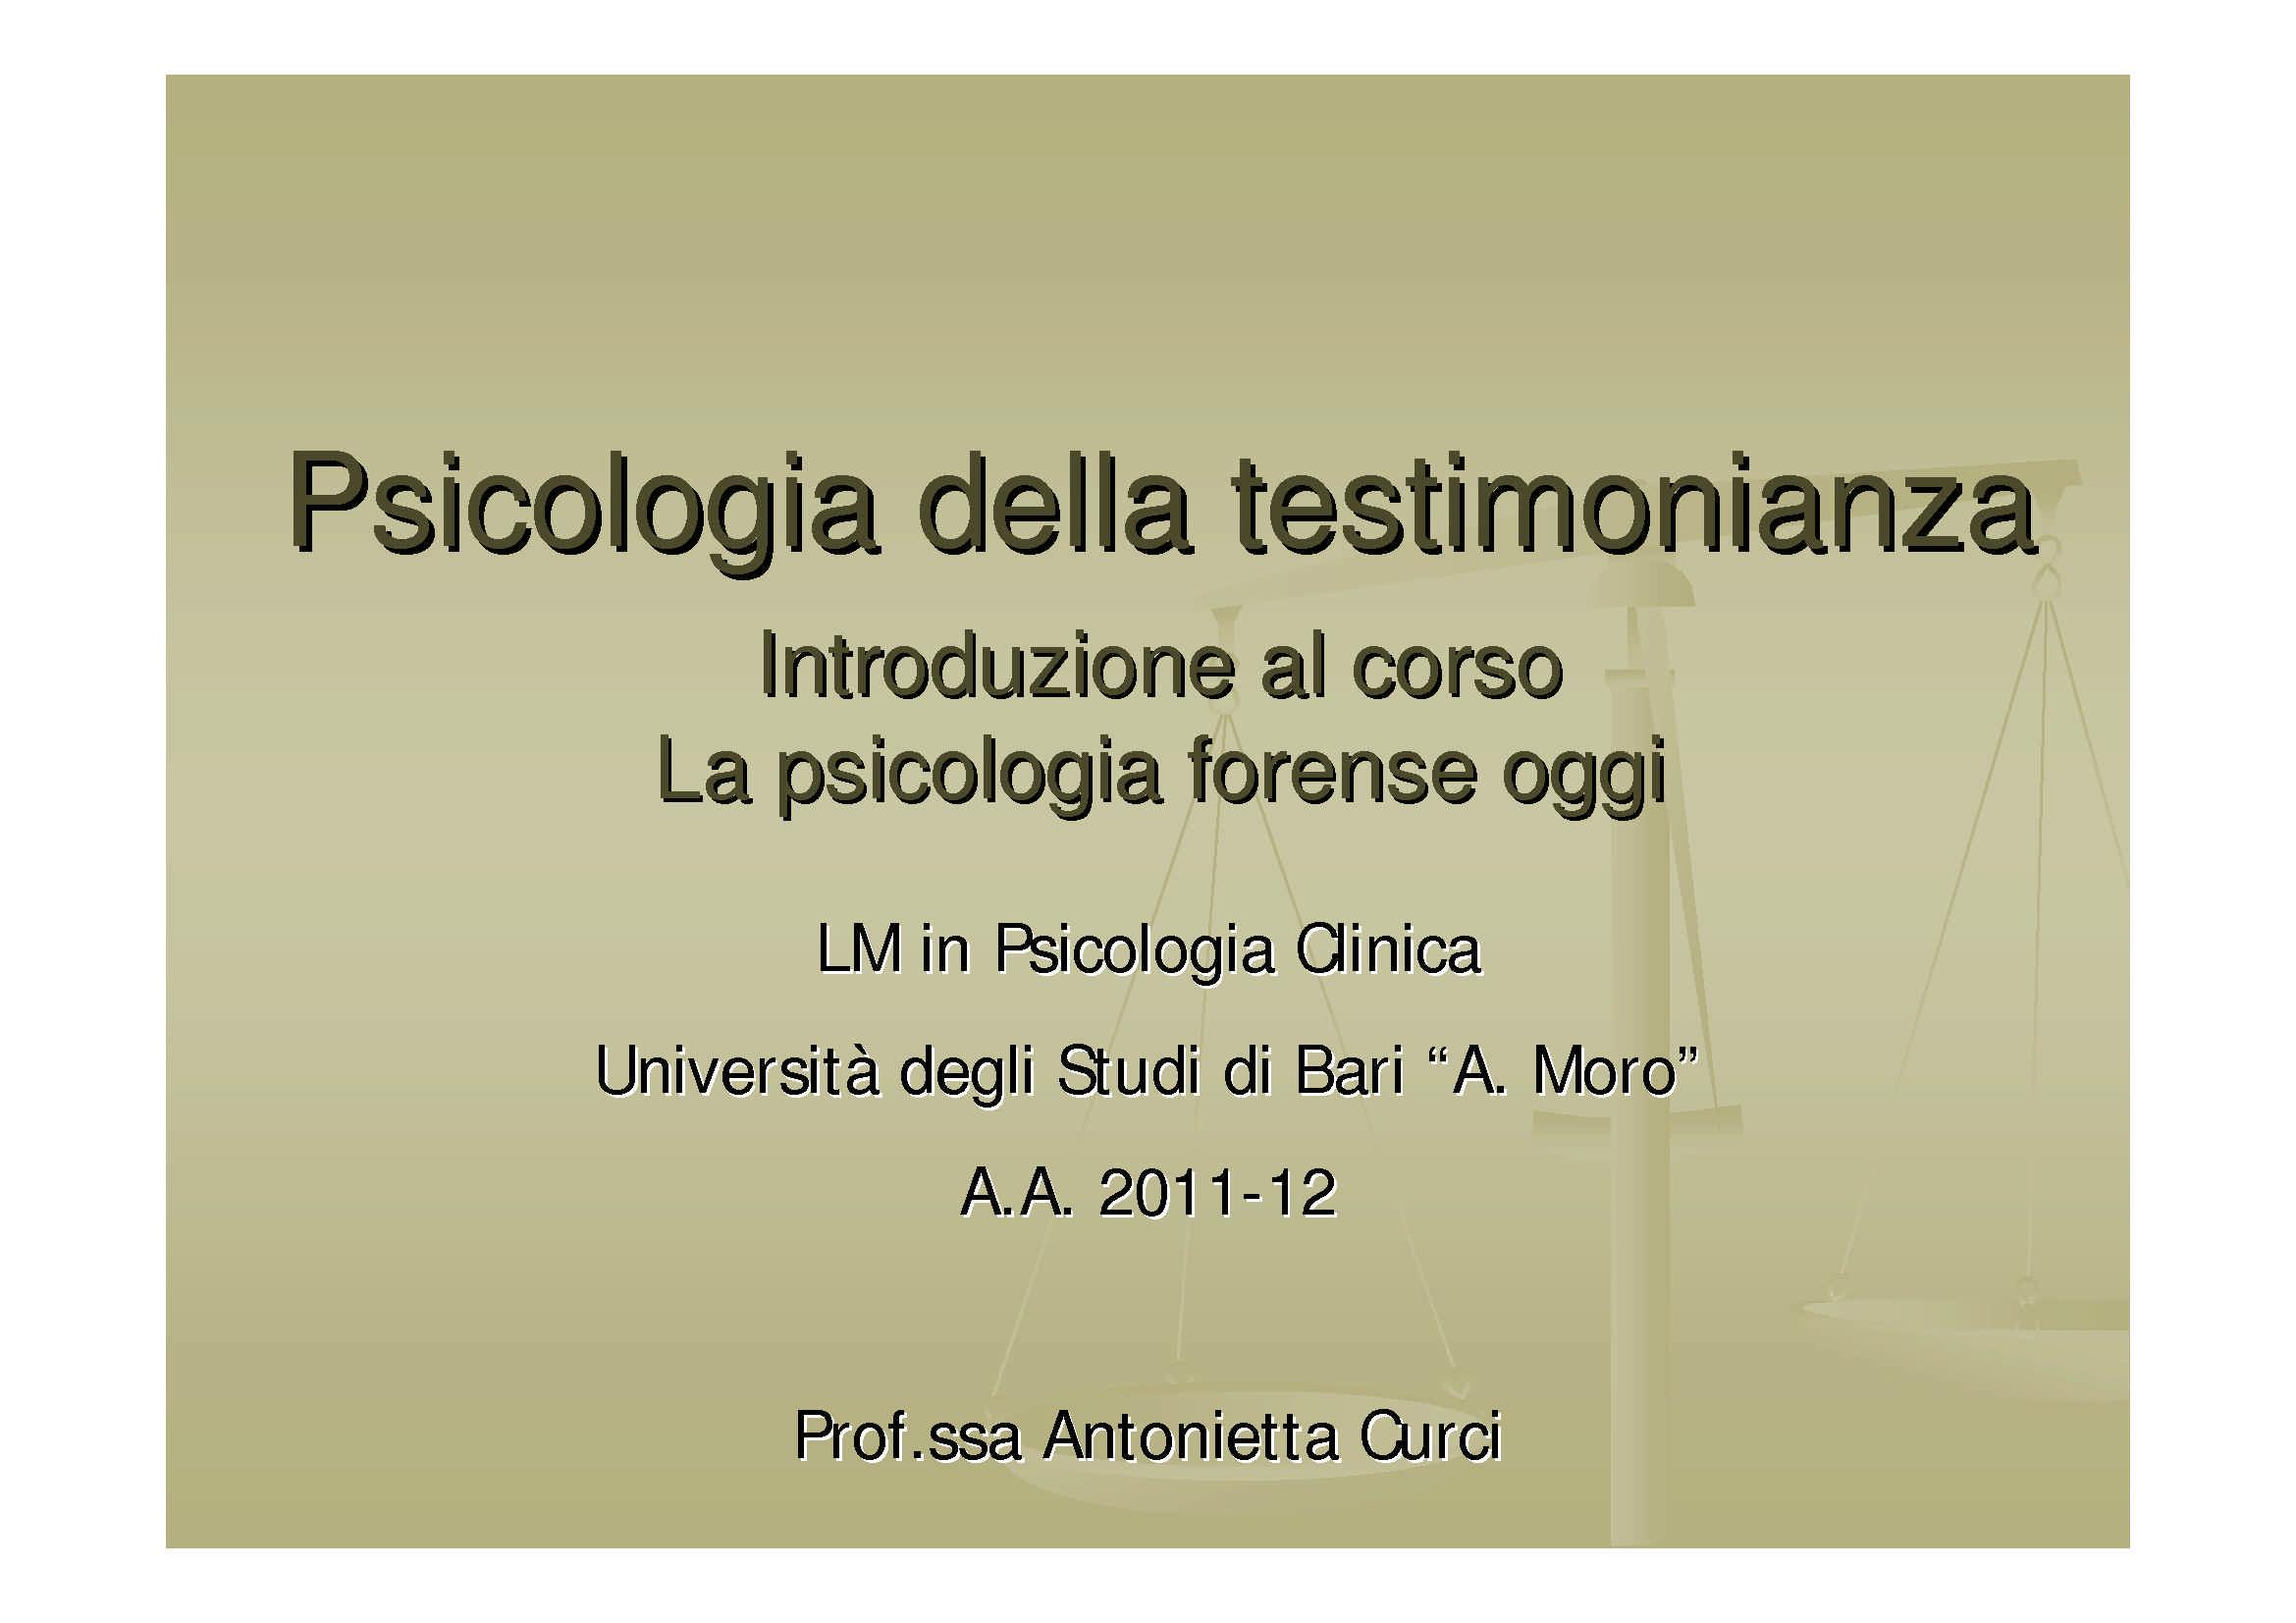 Psicologia forense oggi